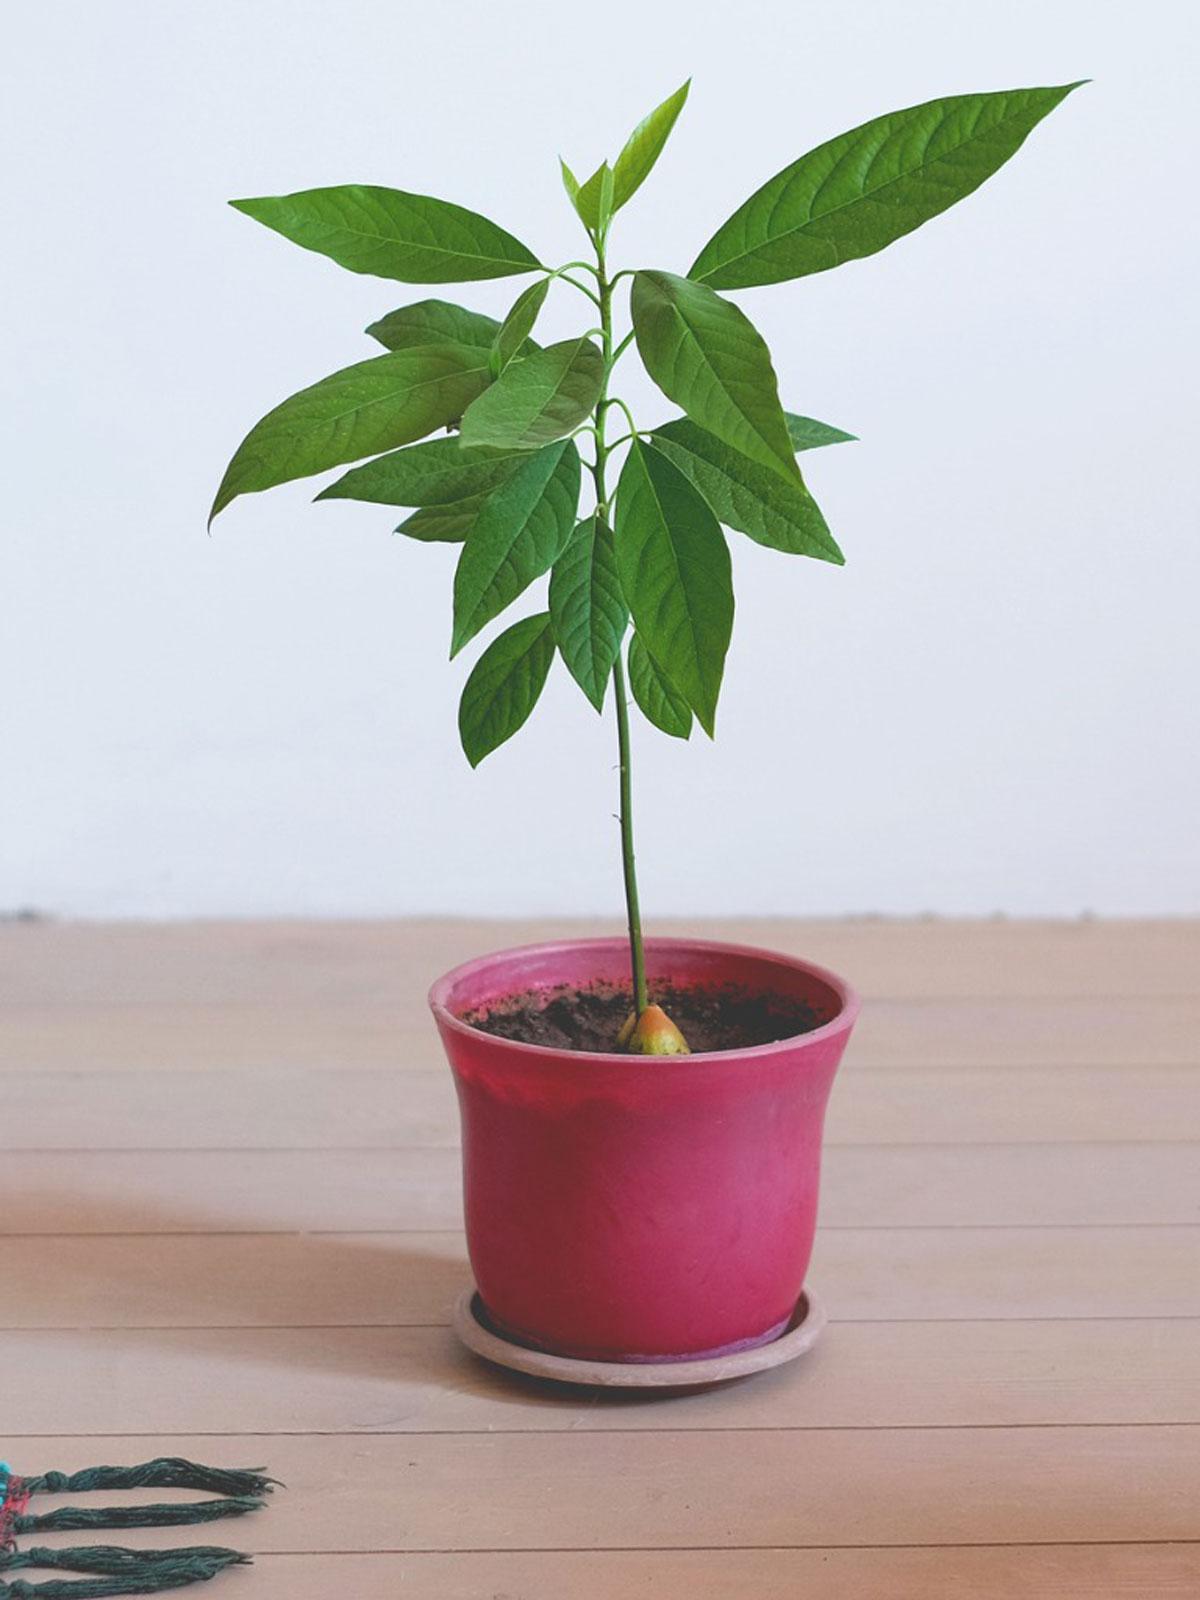 Jo's Avocado Plant